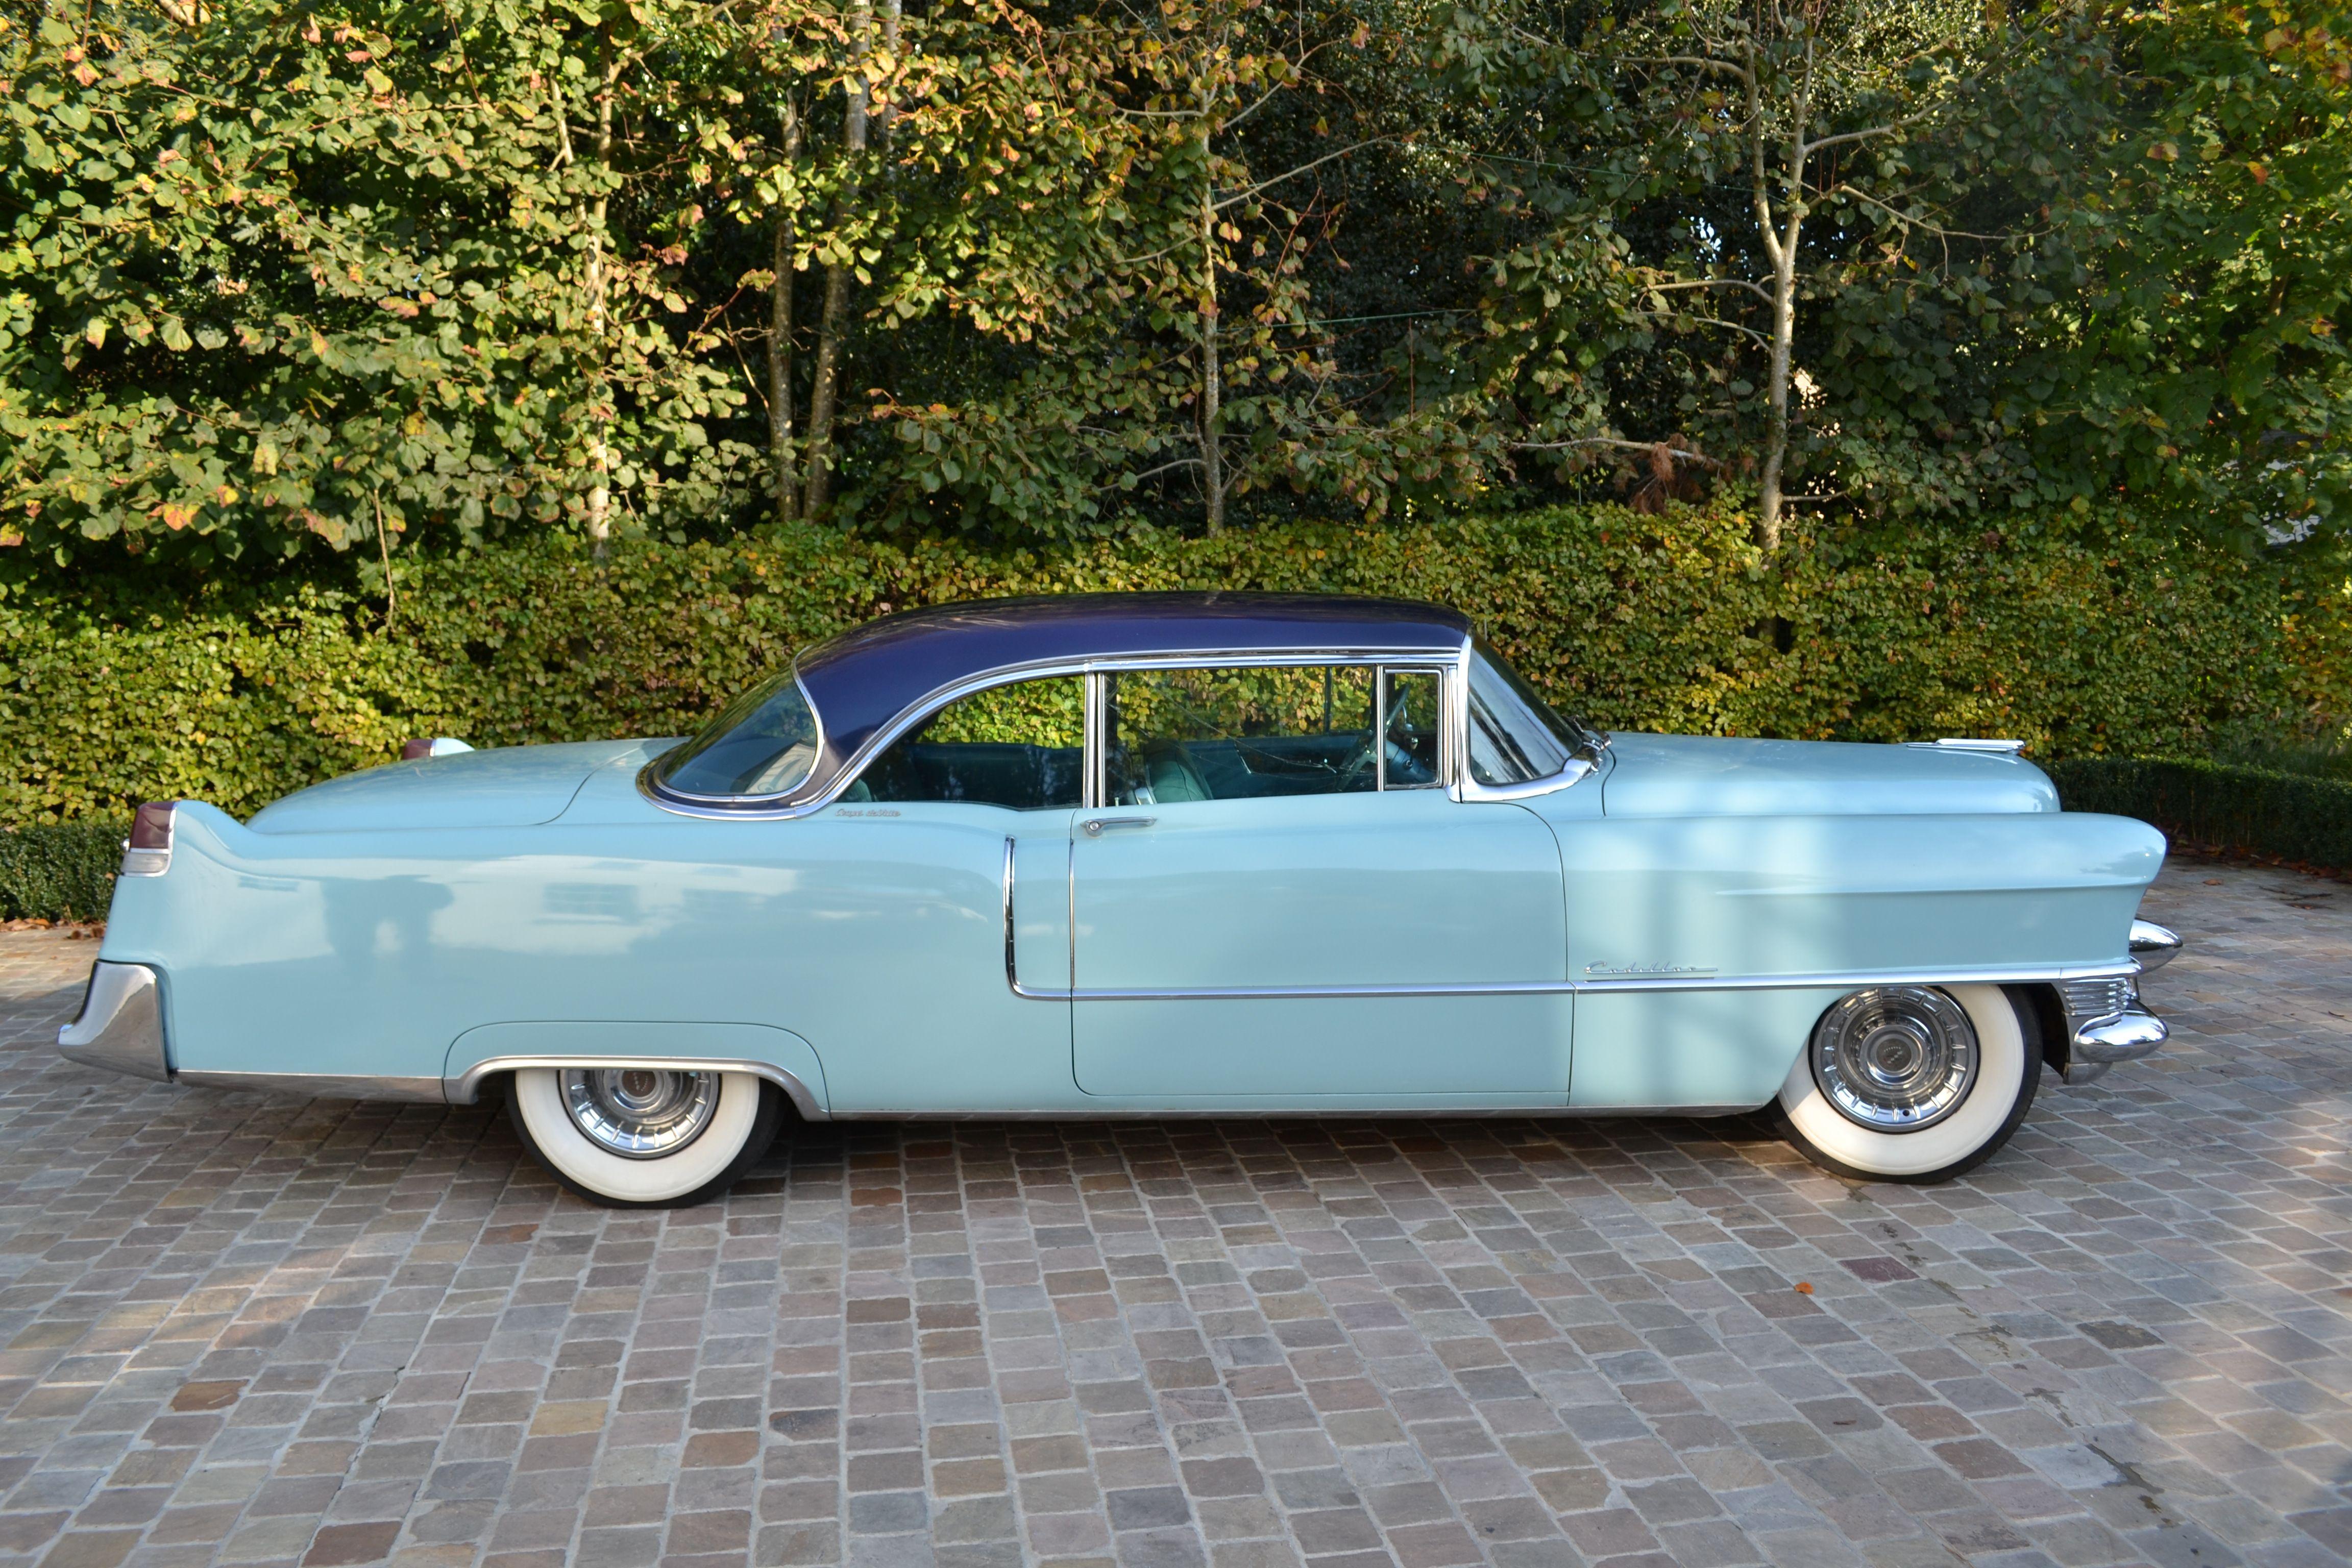 1955 Cadillac Gm T Autos Antiguos 1951 Sedan Deville Coupe